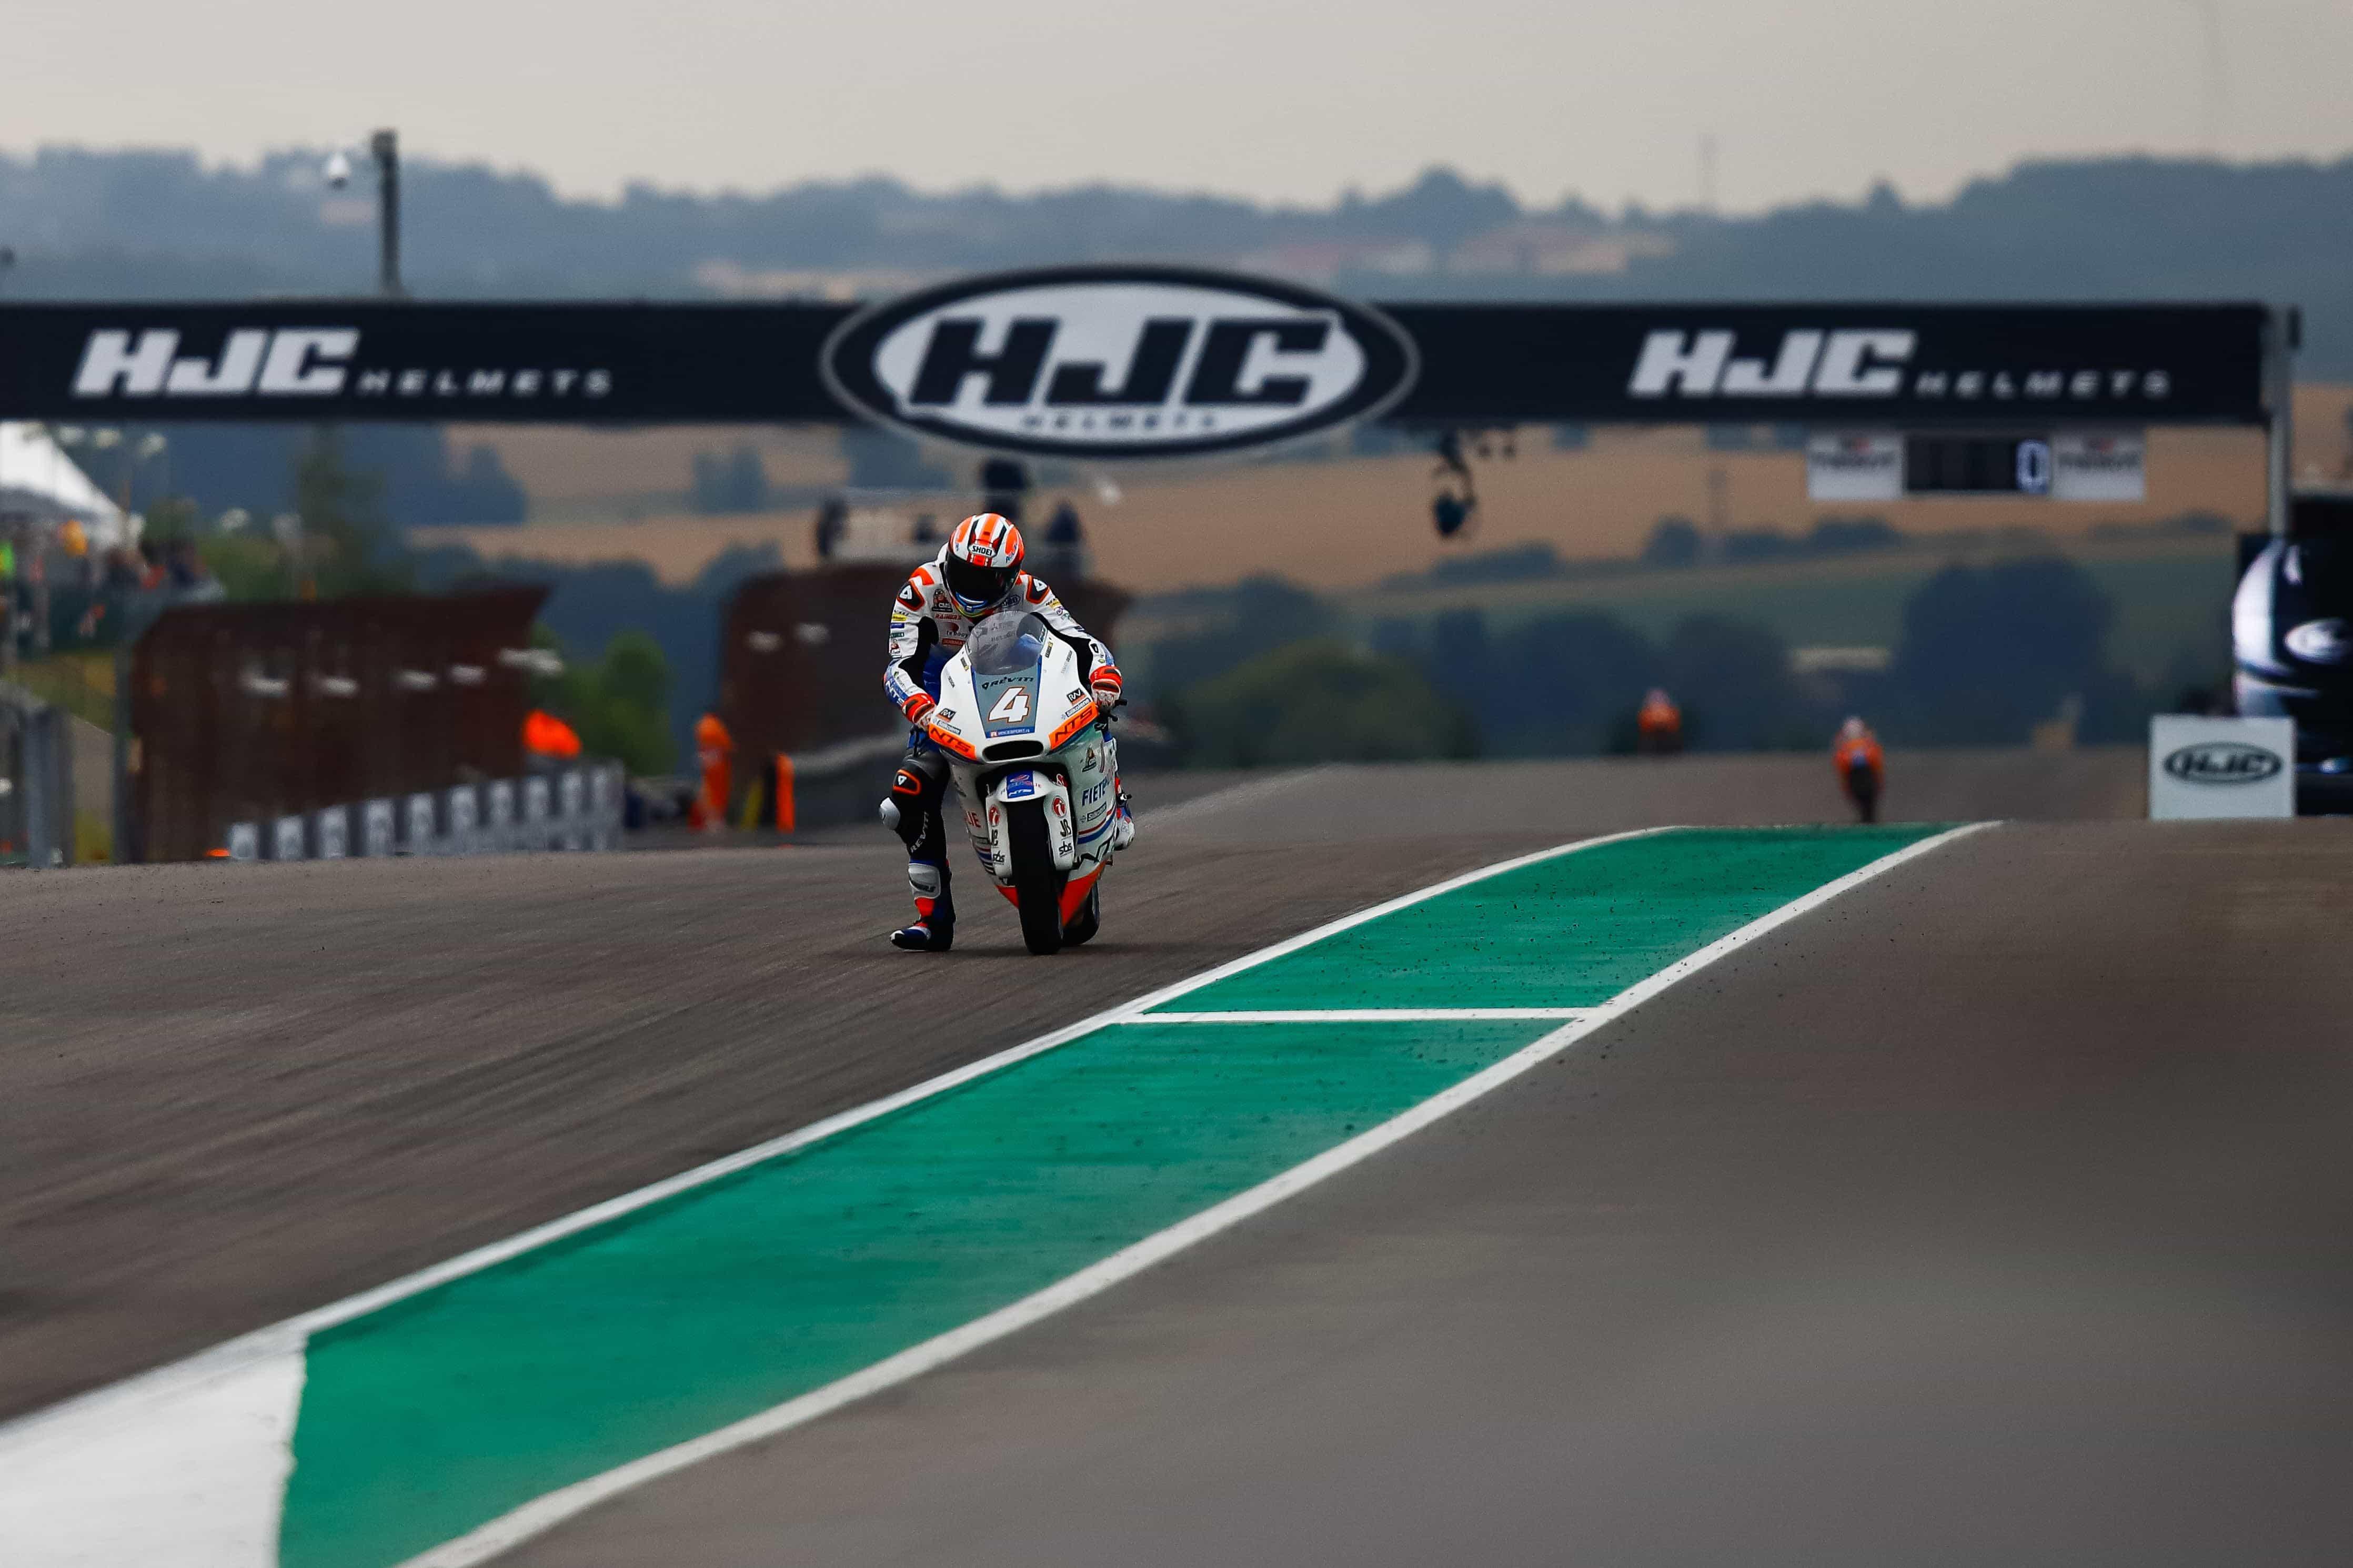 NTS RW Racing GP ドイツGP決勝レースレポート